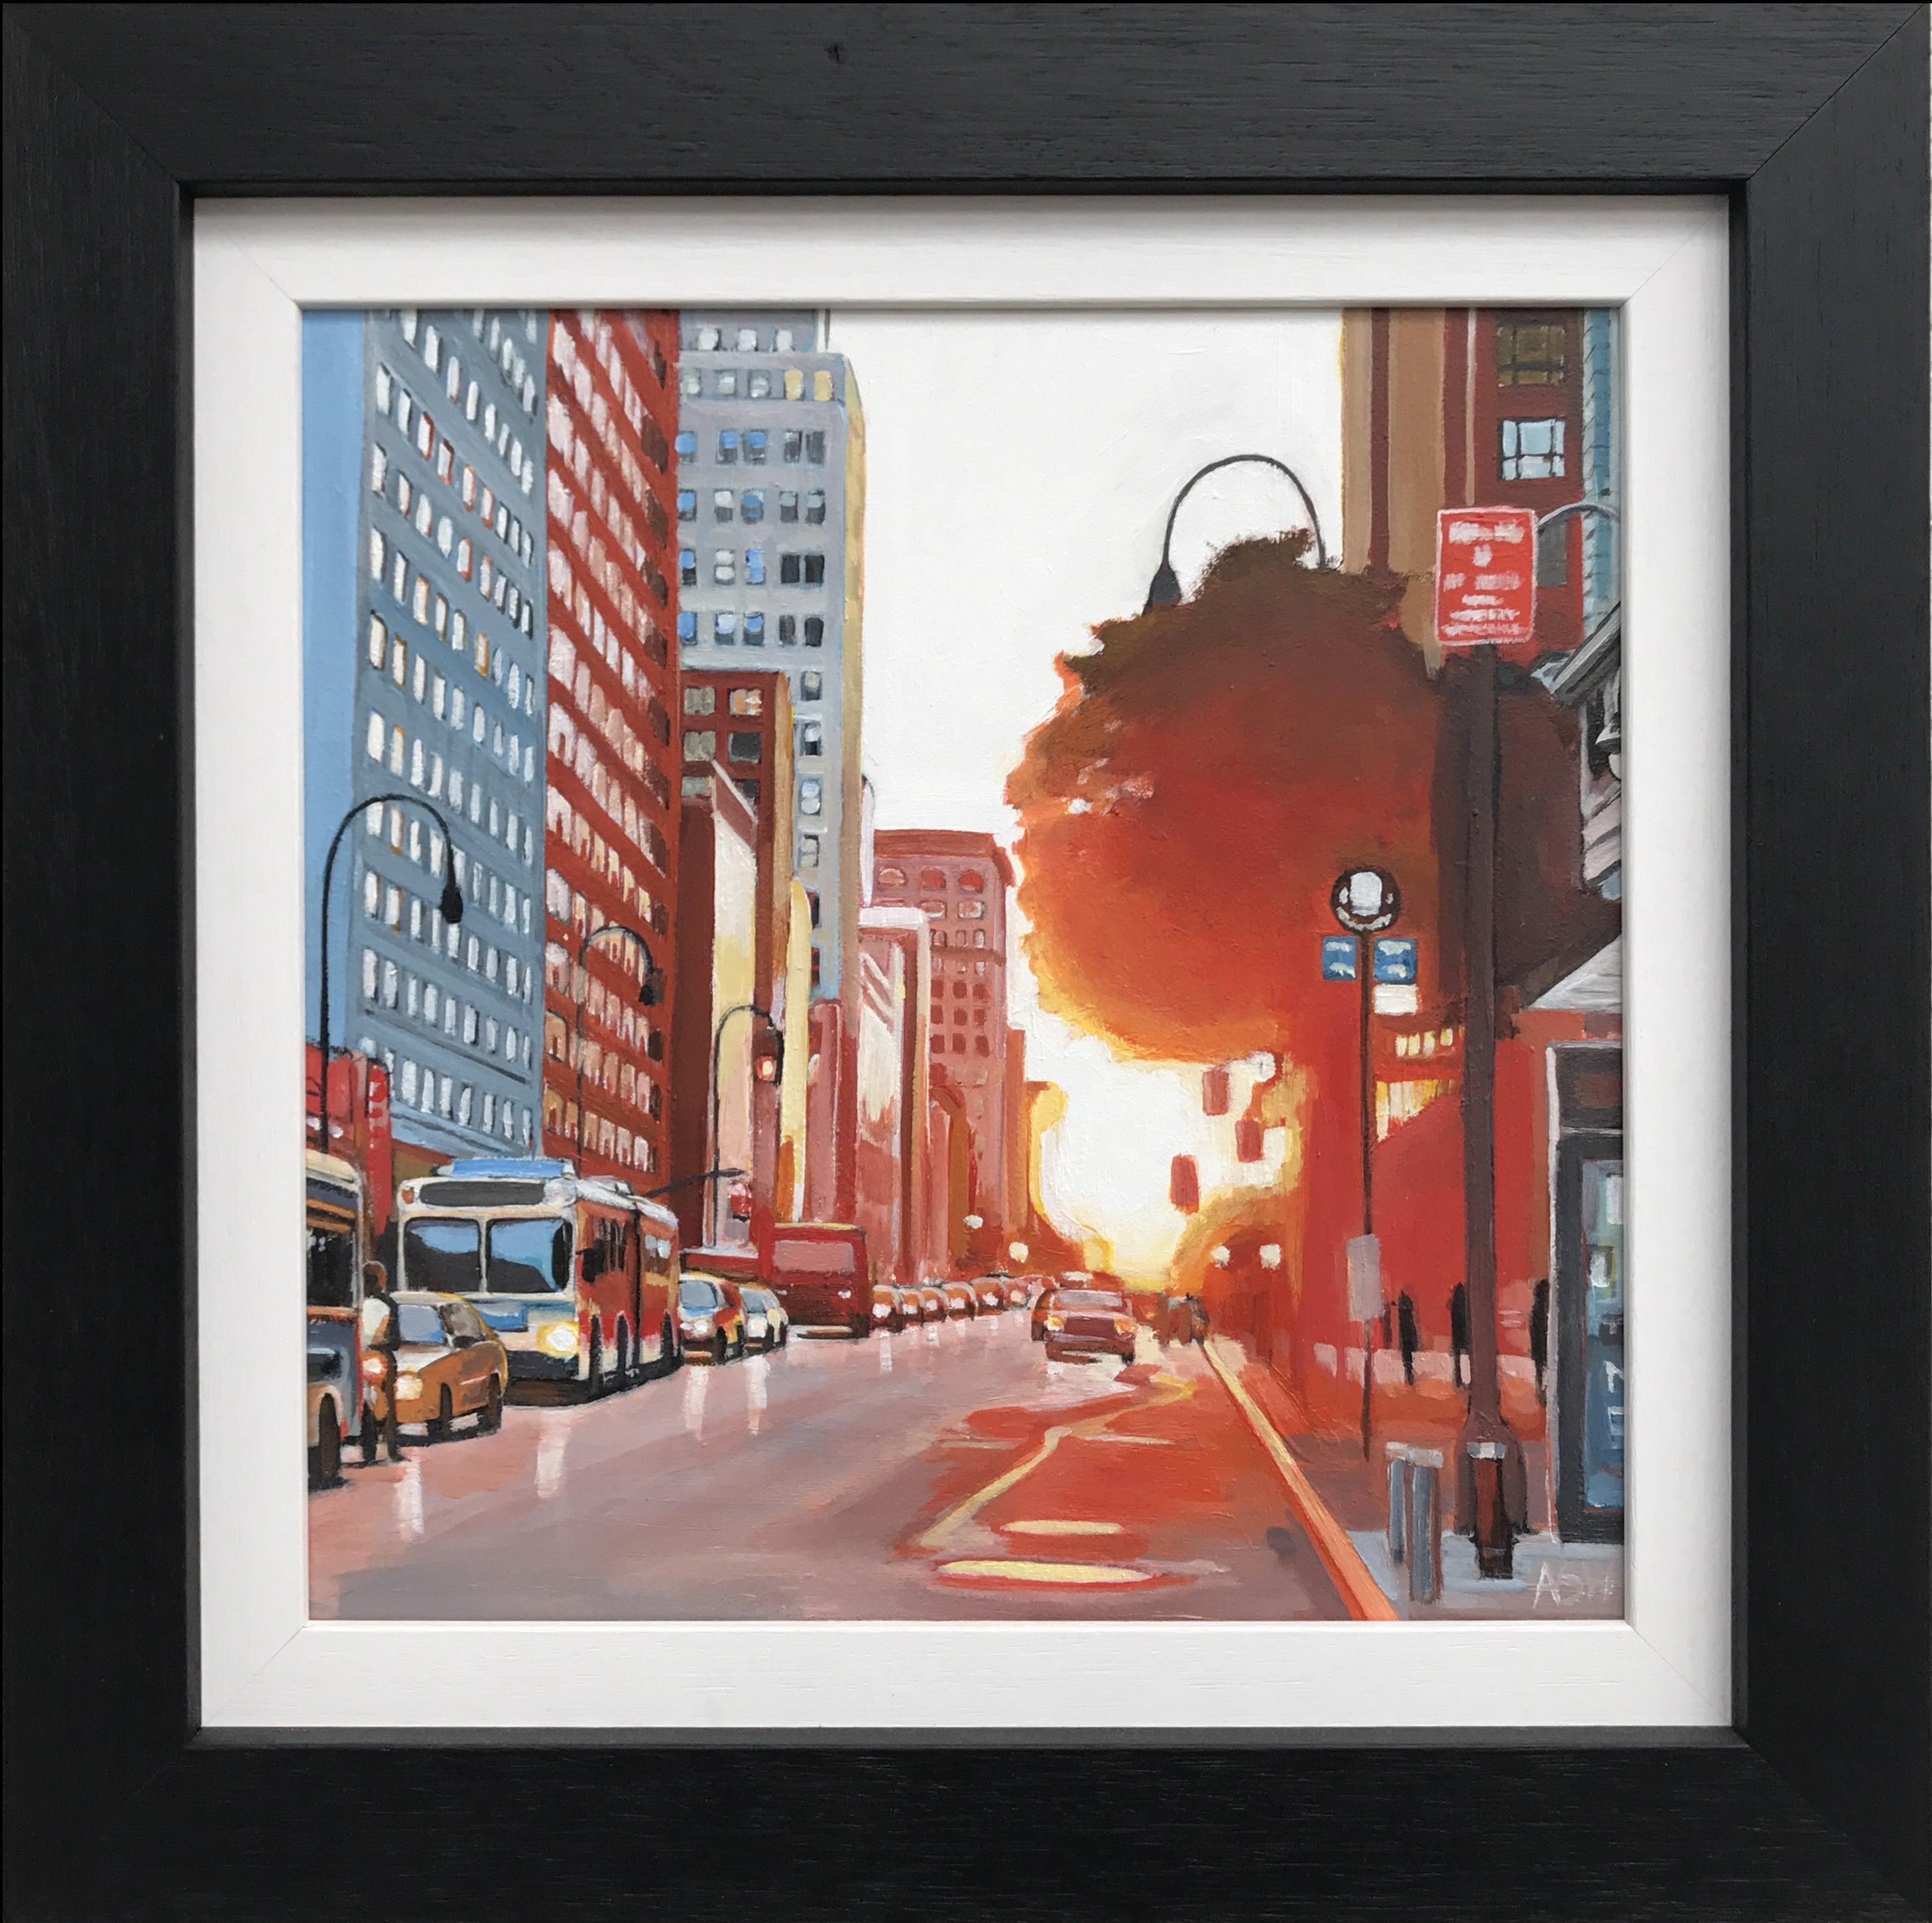 New York Street Scene Urban Landscape Painting from British Artist Collection